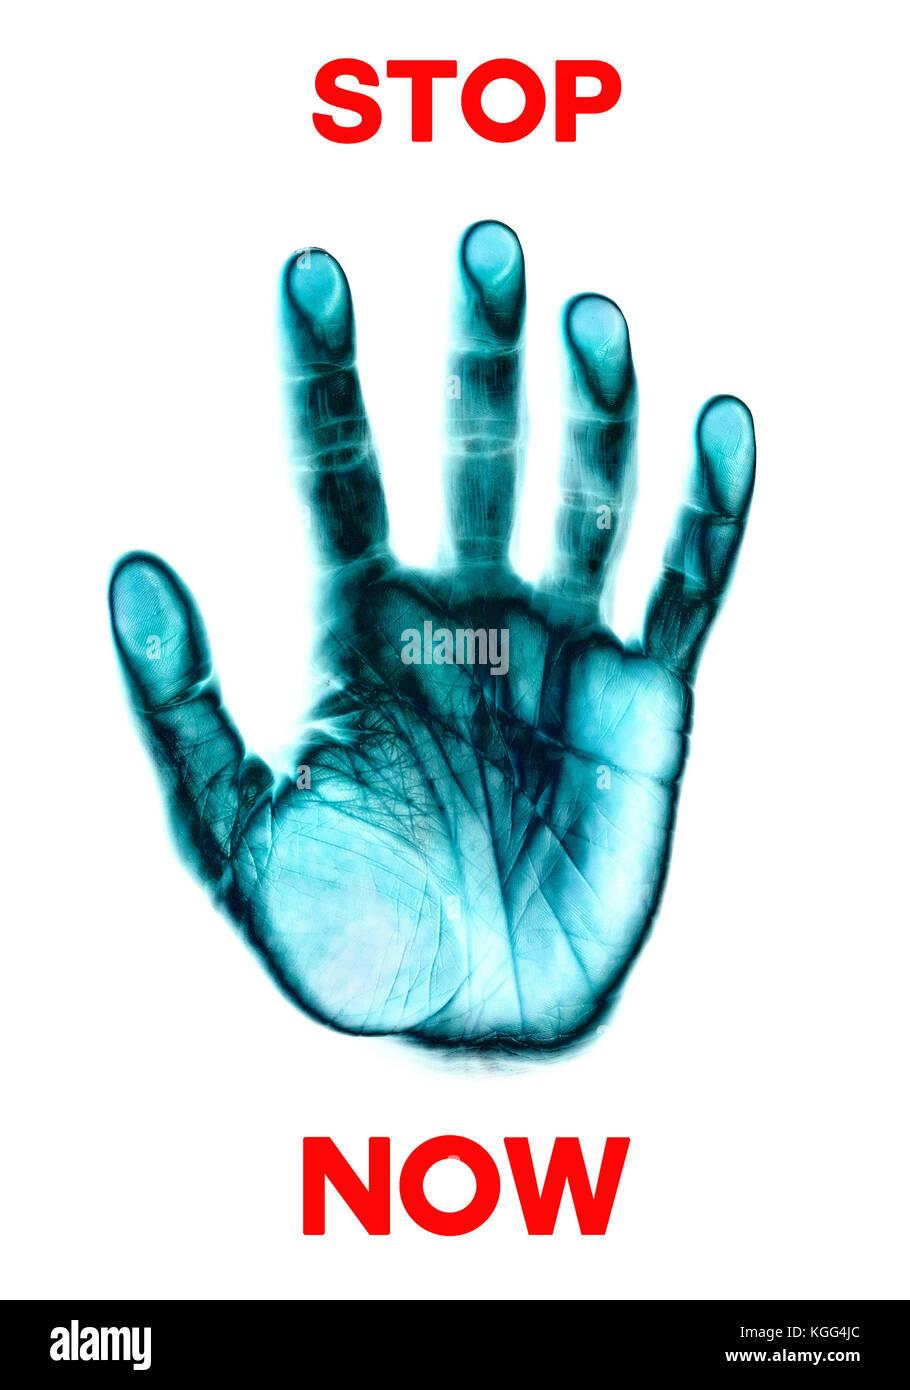 Detener ahora palabras e impresión de mano Imagen De Stock